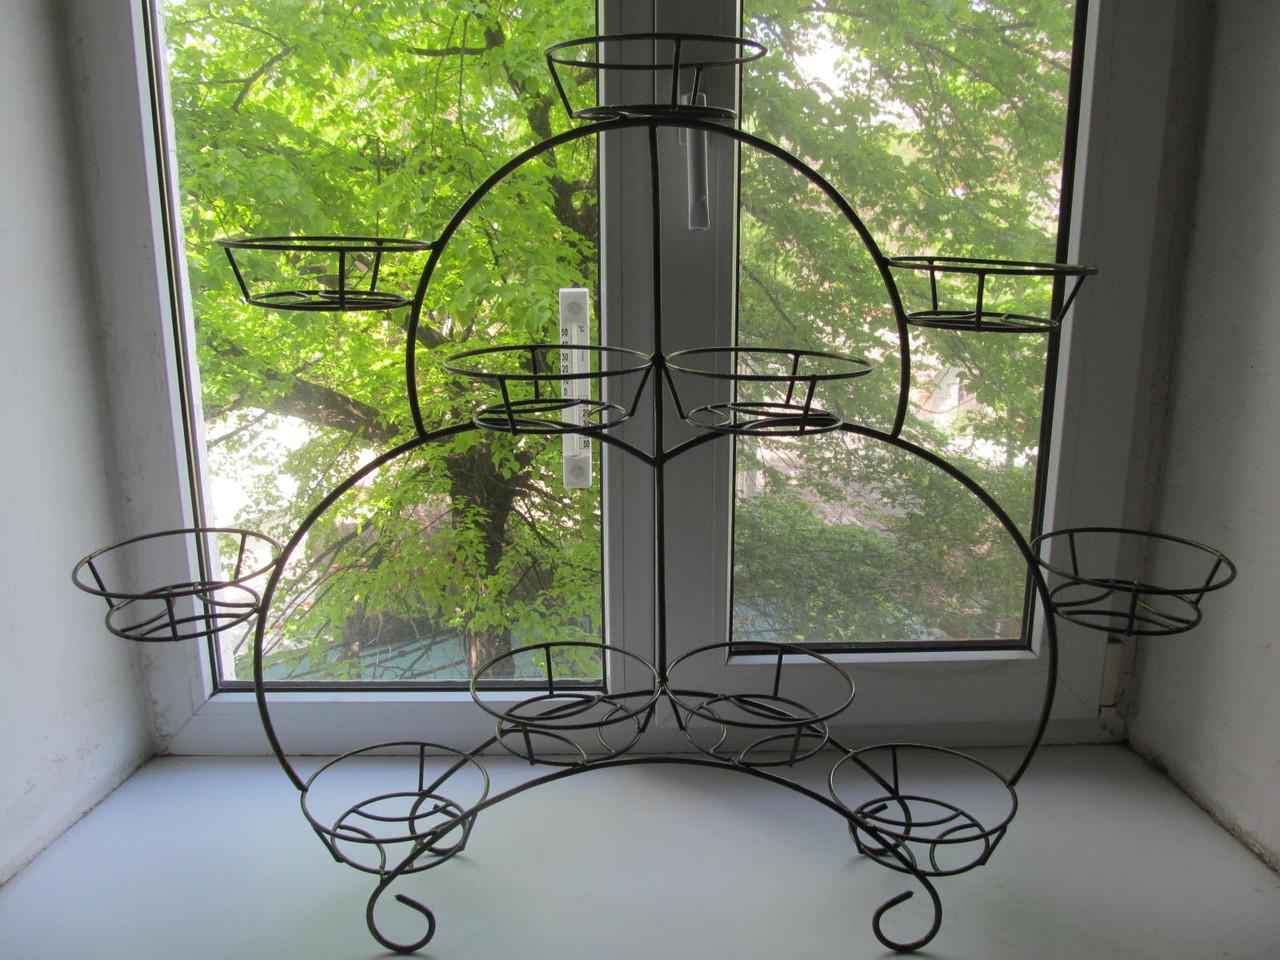 Подставки для цветов на подоконник Условия для выращивания цветов на окне 15